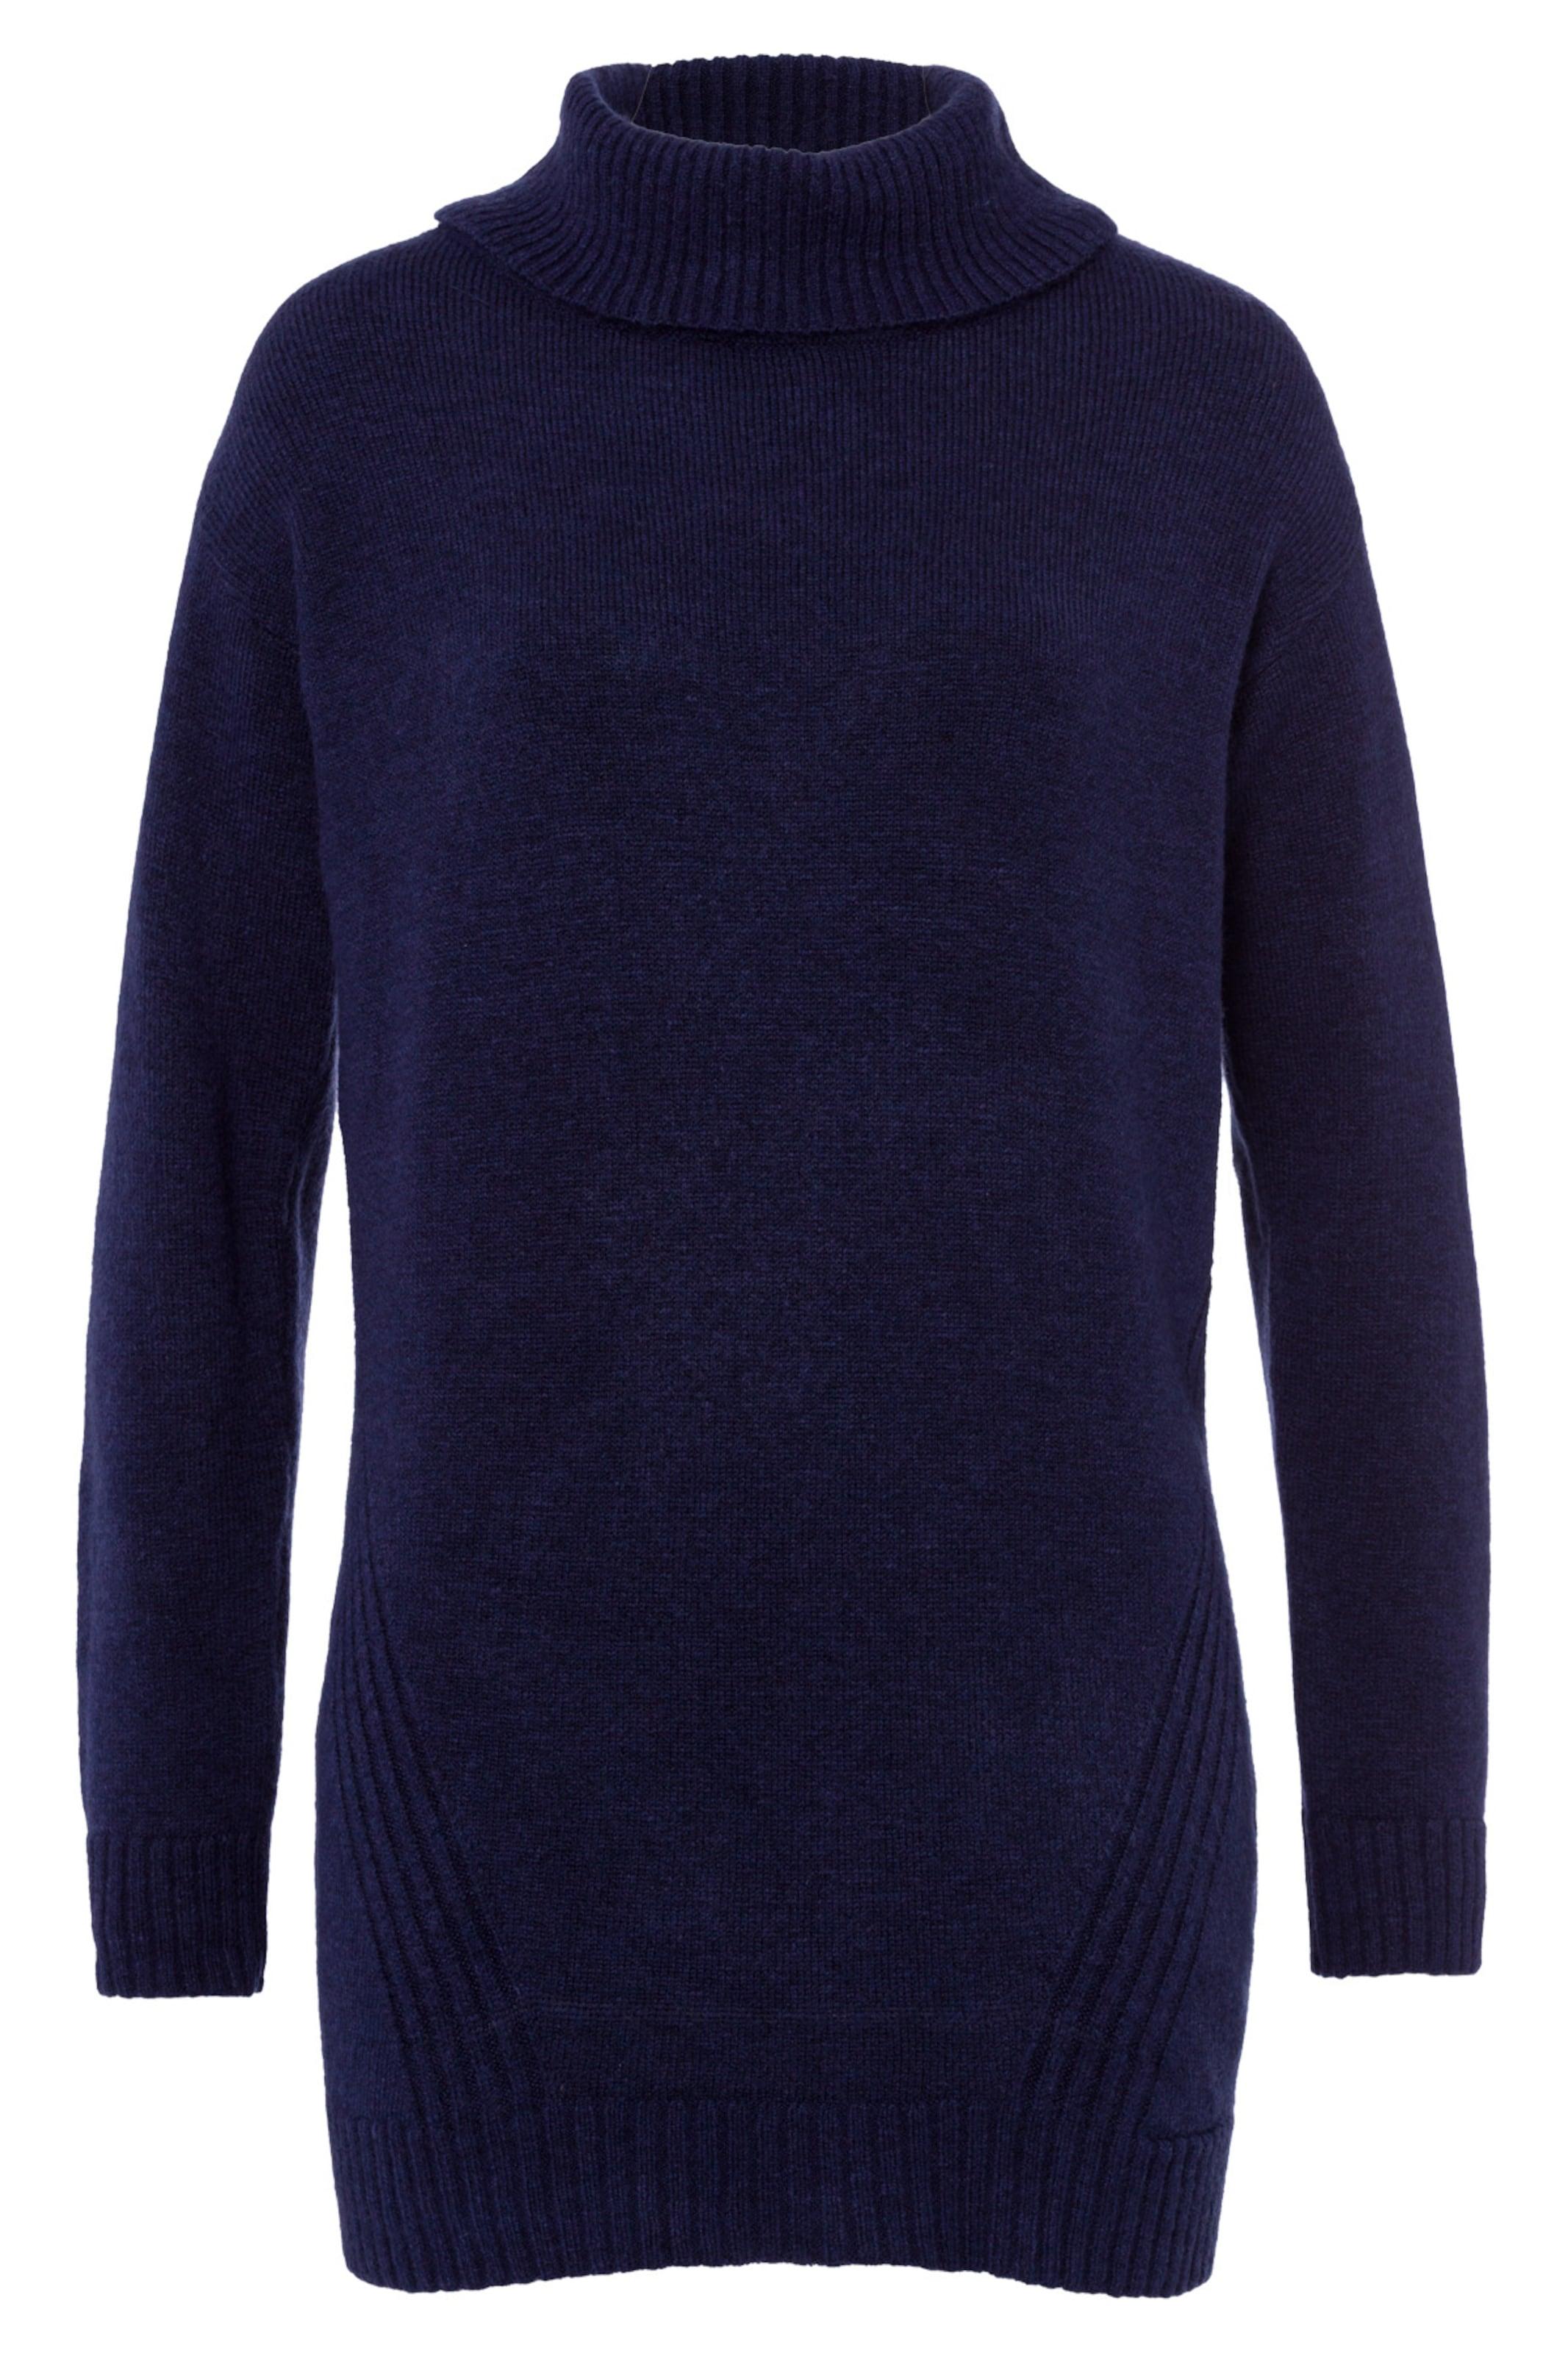 Damen MORE & MORE Pullover blau, blau,  grau | 04031663746468